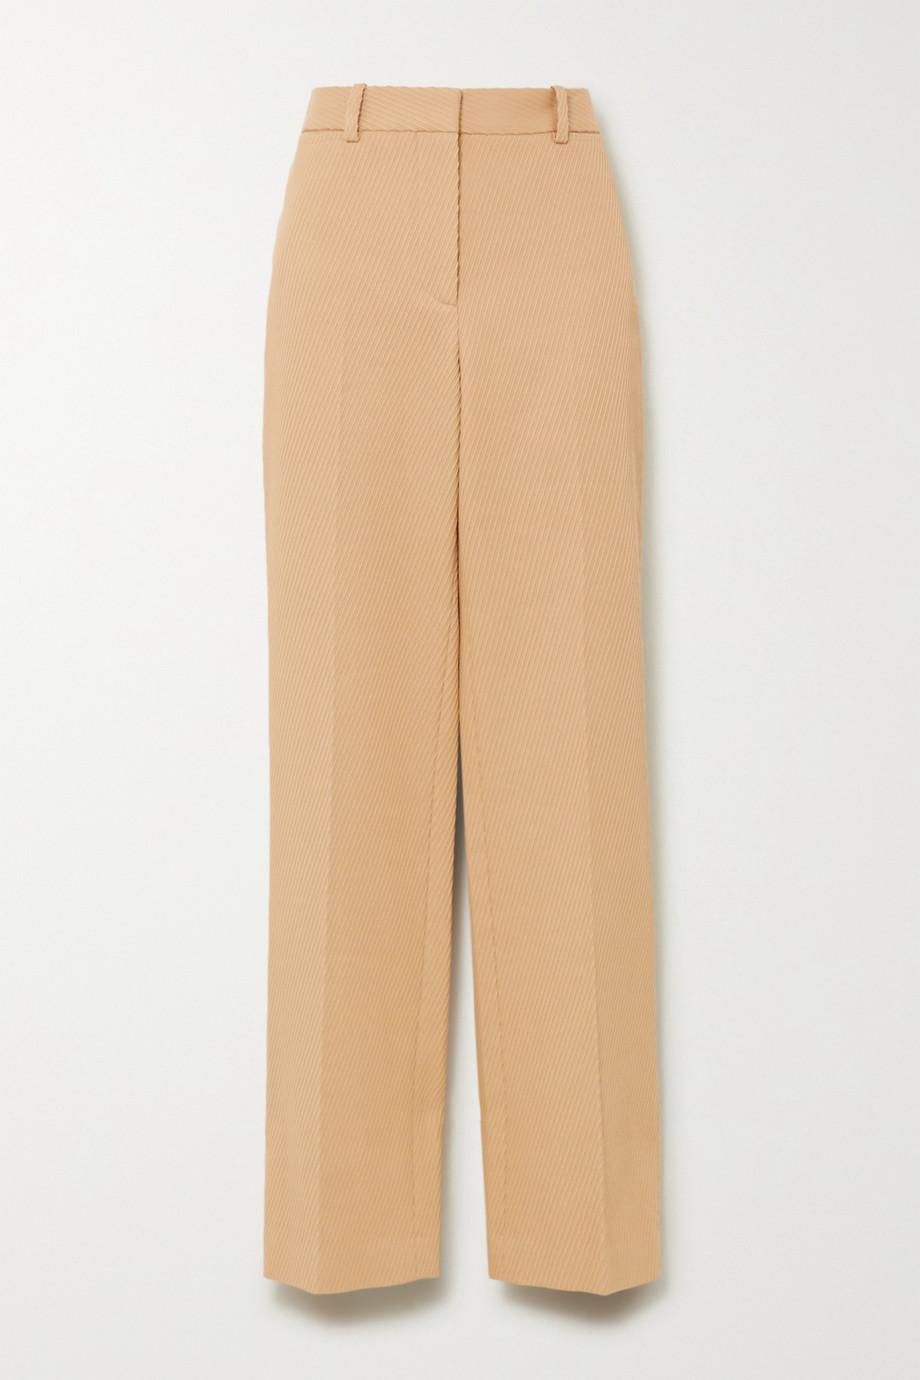 Victoria Beckham Ribbed cotton straight-leg pants